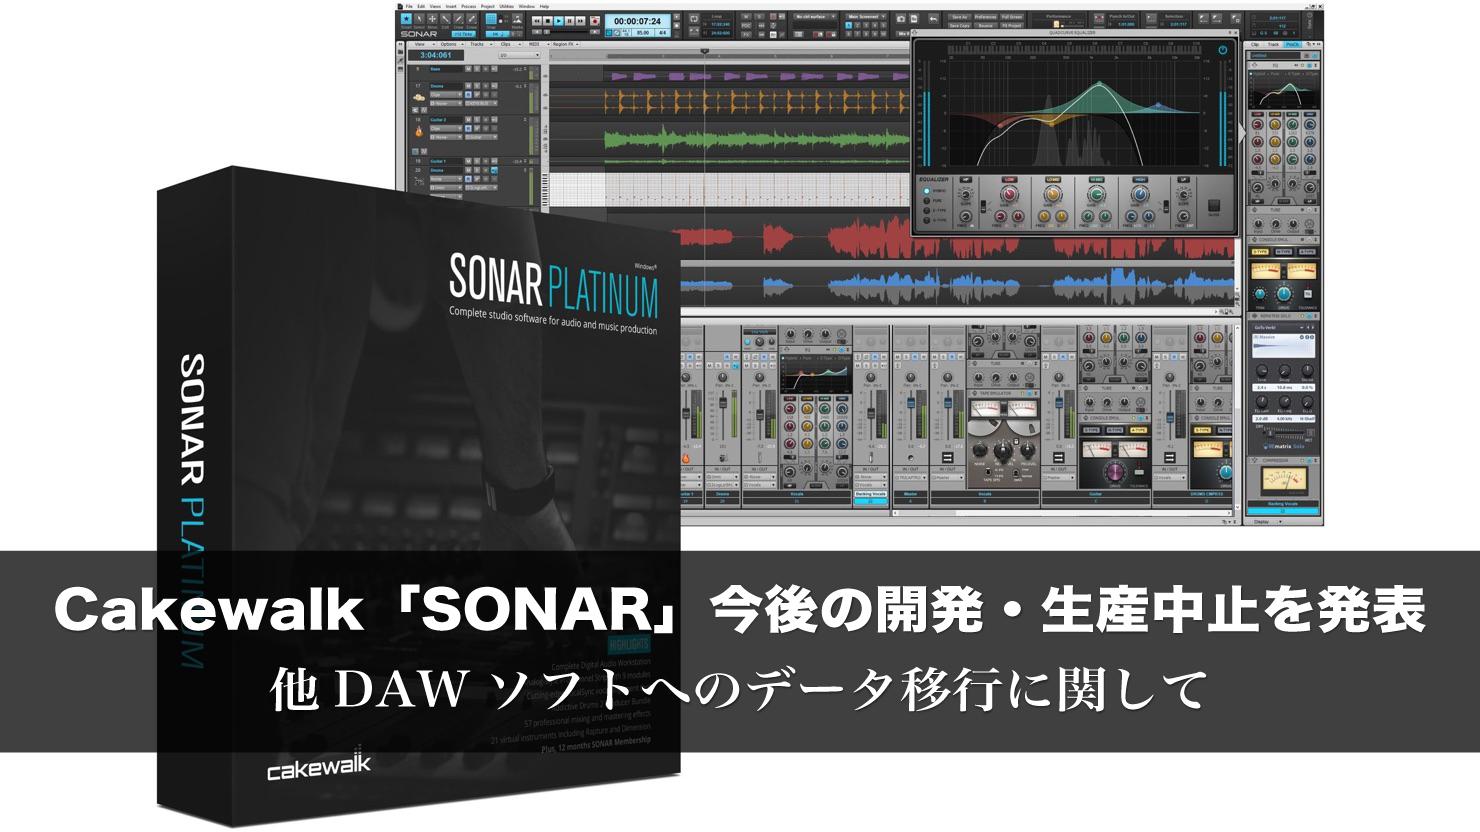 cakewalk-sonar-gibson